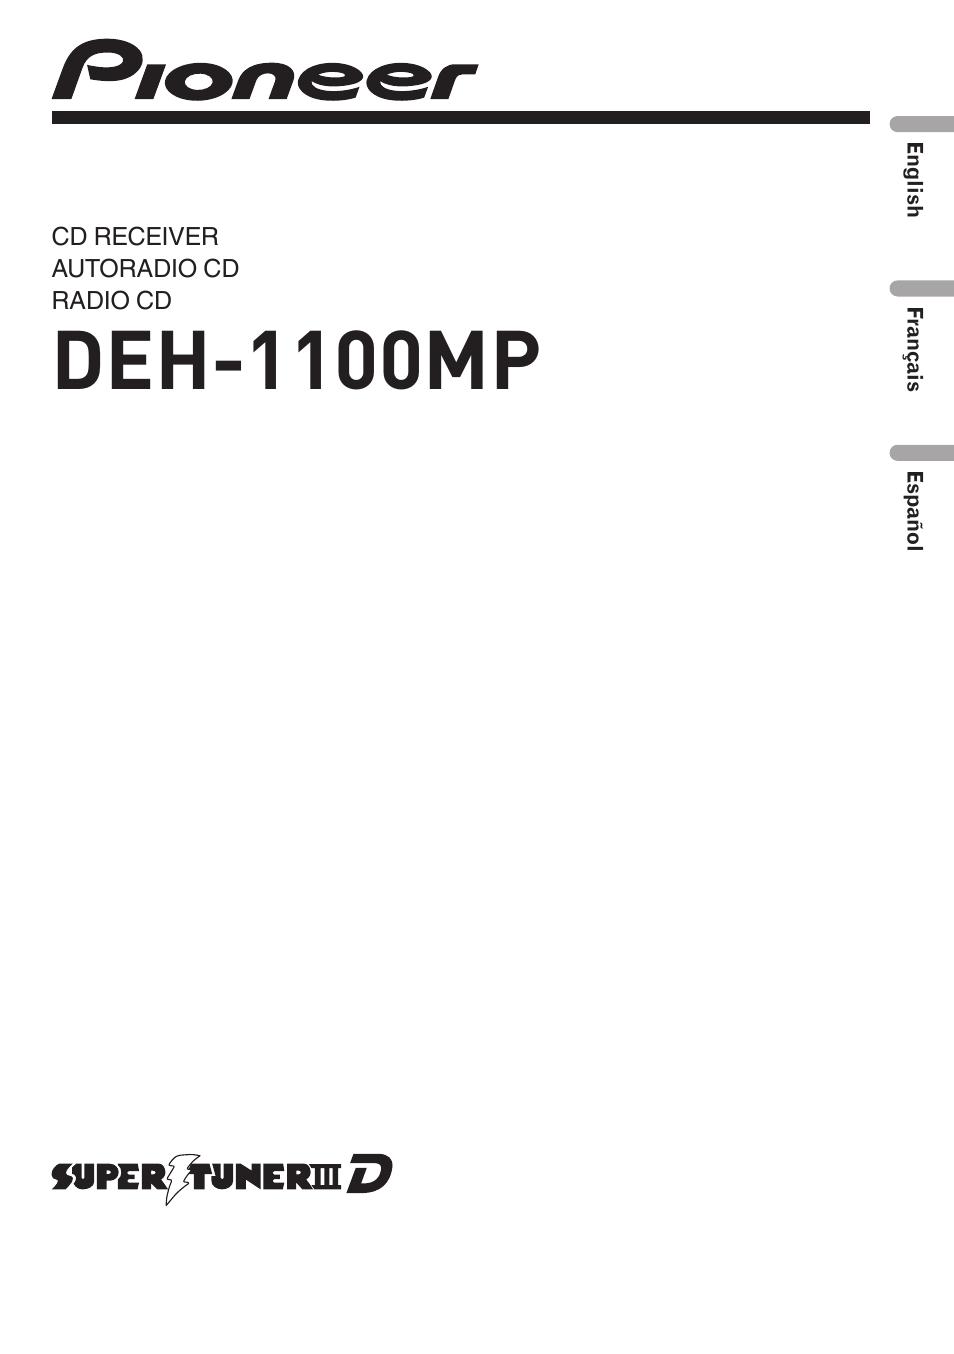 pioneer deh 1100mp user manual 62 pages rh manualsdir com pioneer deh-1100mp wiring diagram pioneer radio deh 1100mp manual